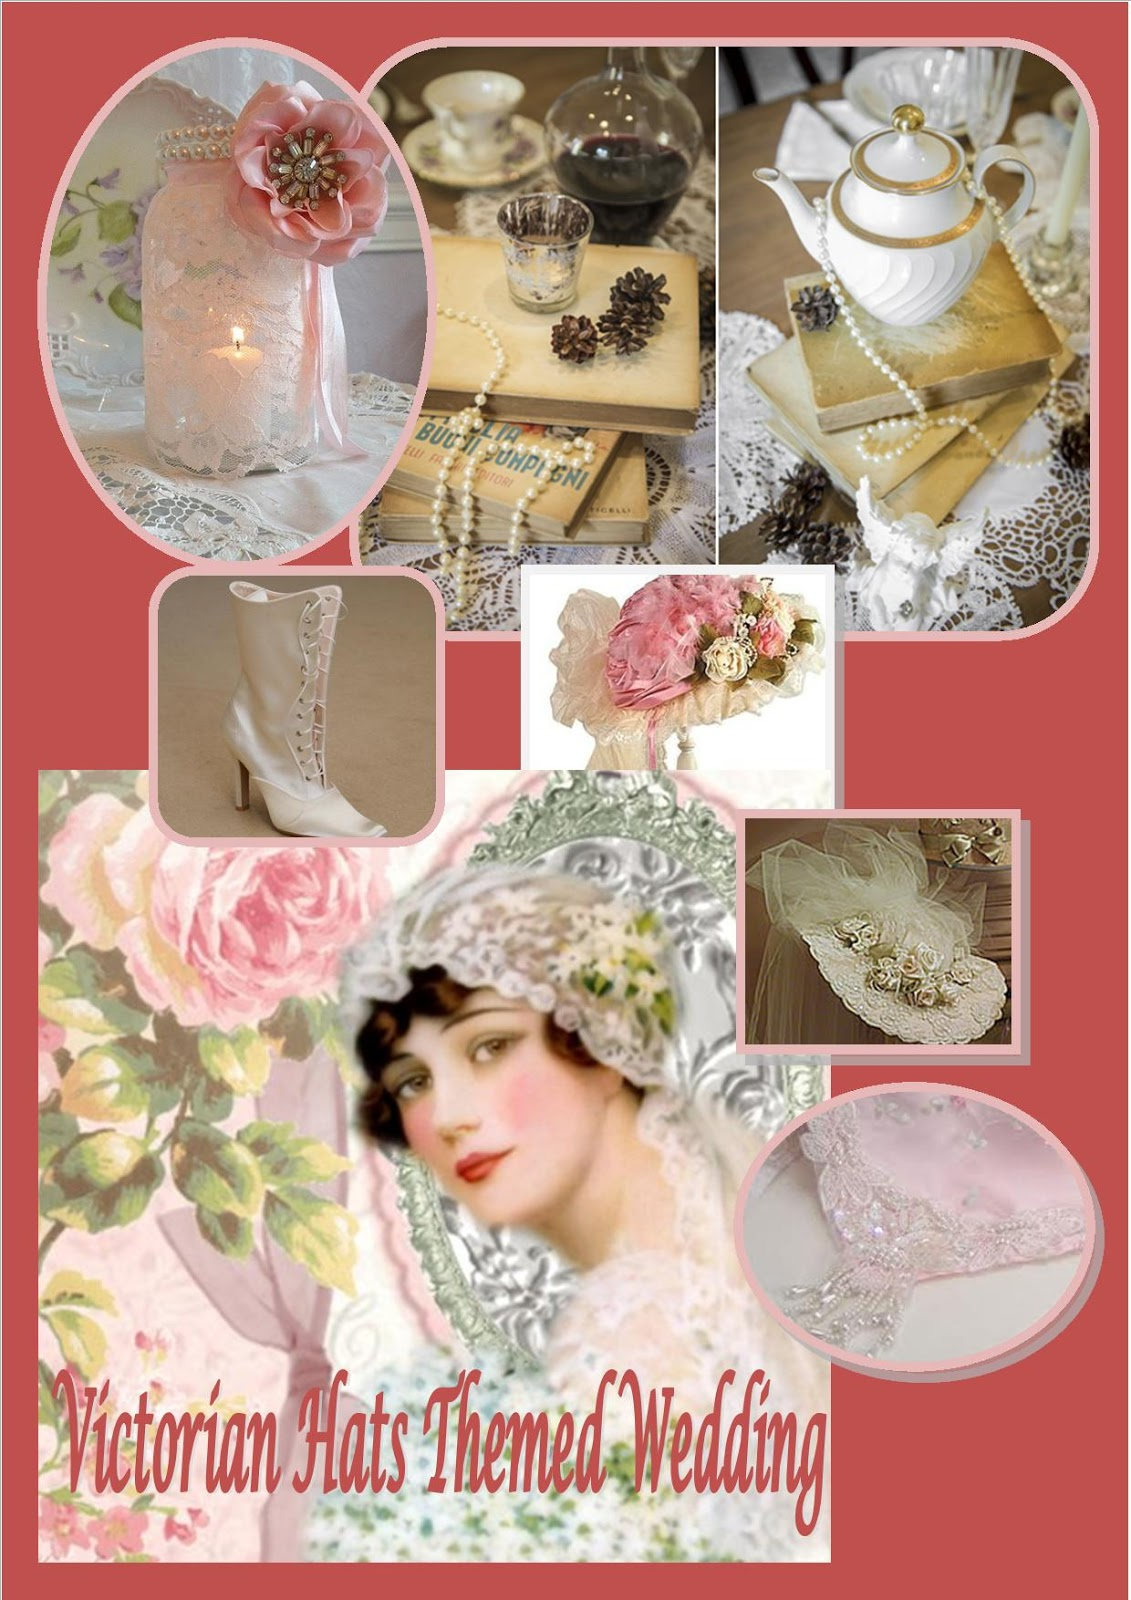 Imagine Themed Decor Victorian Hat Themed Wedding